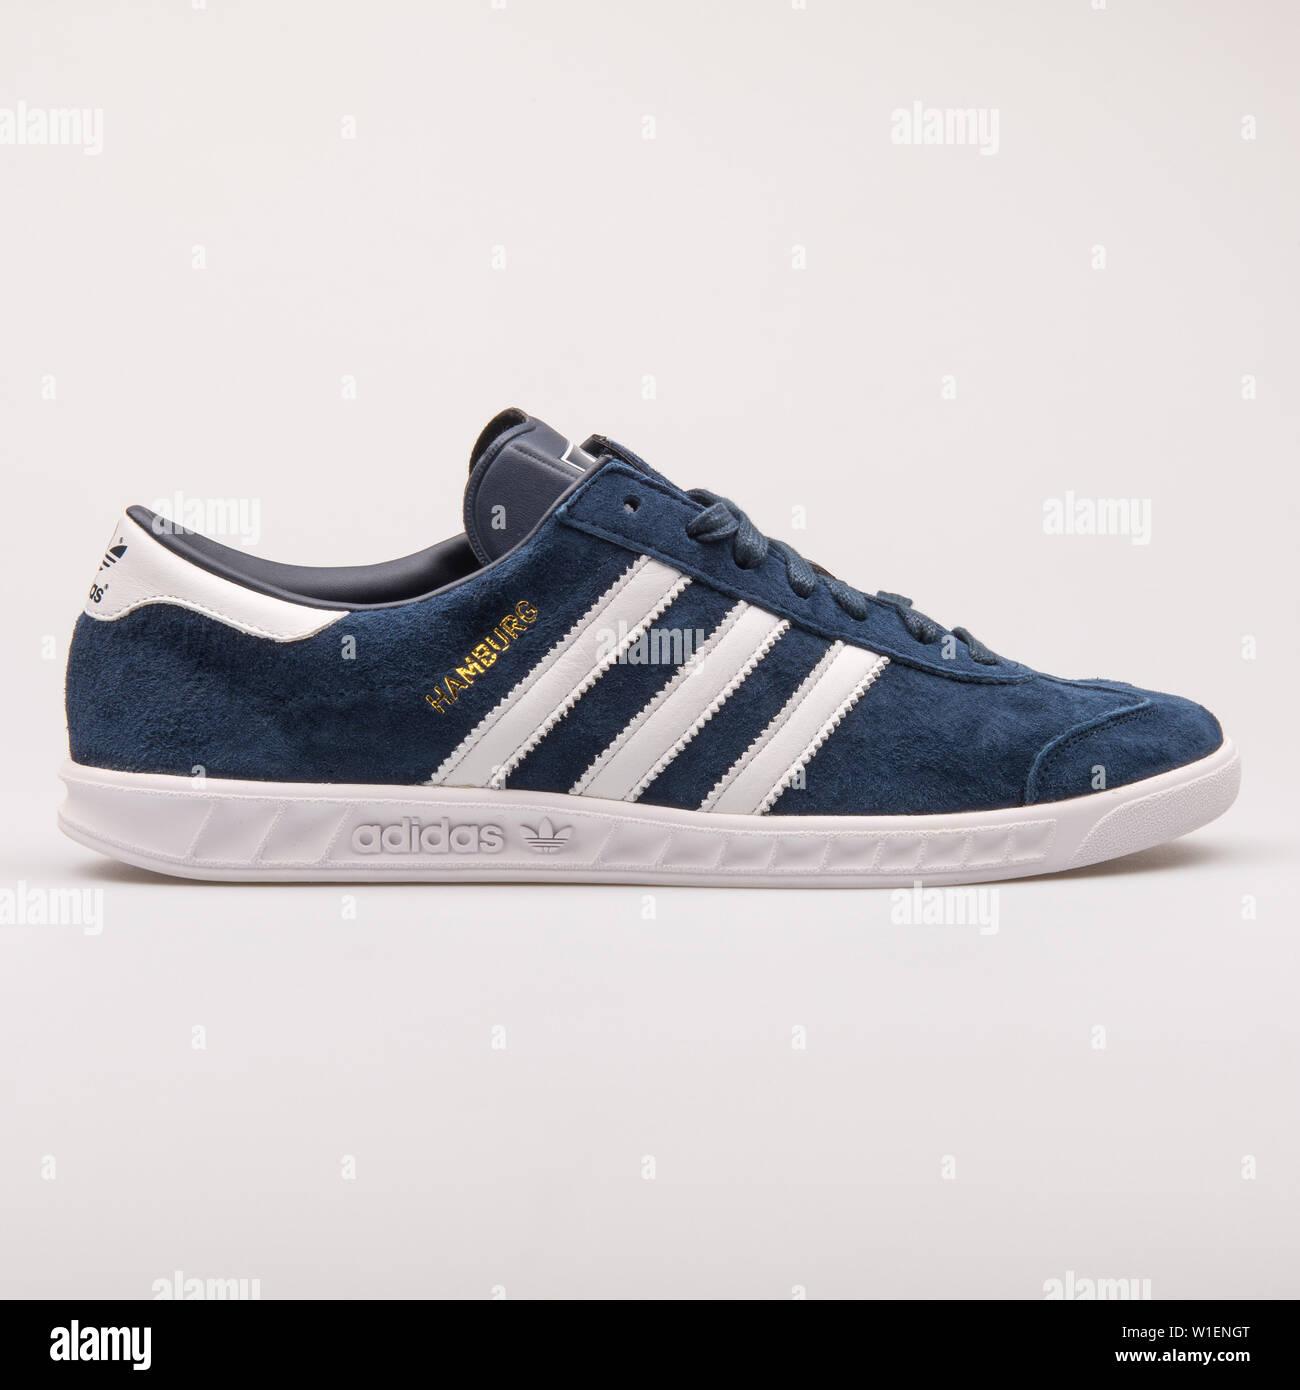 Adidas Hamburg Sneaker